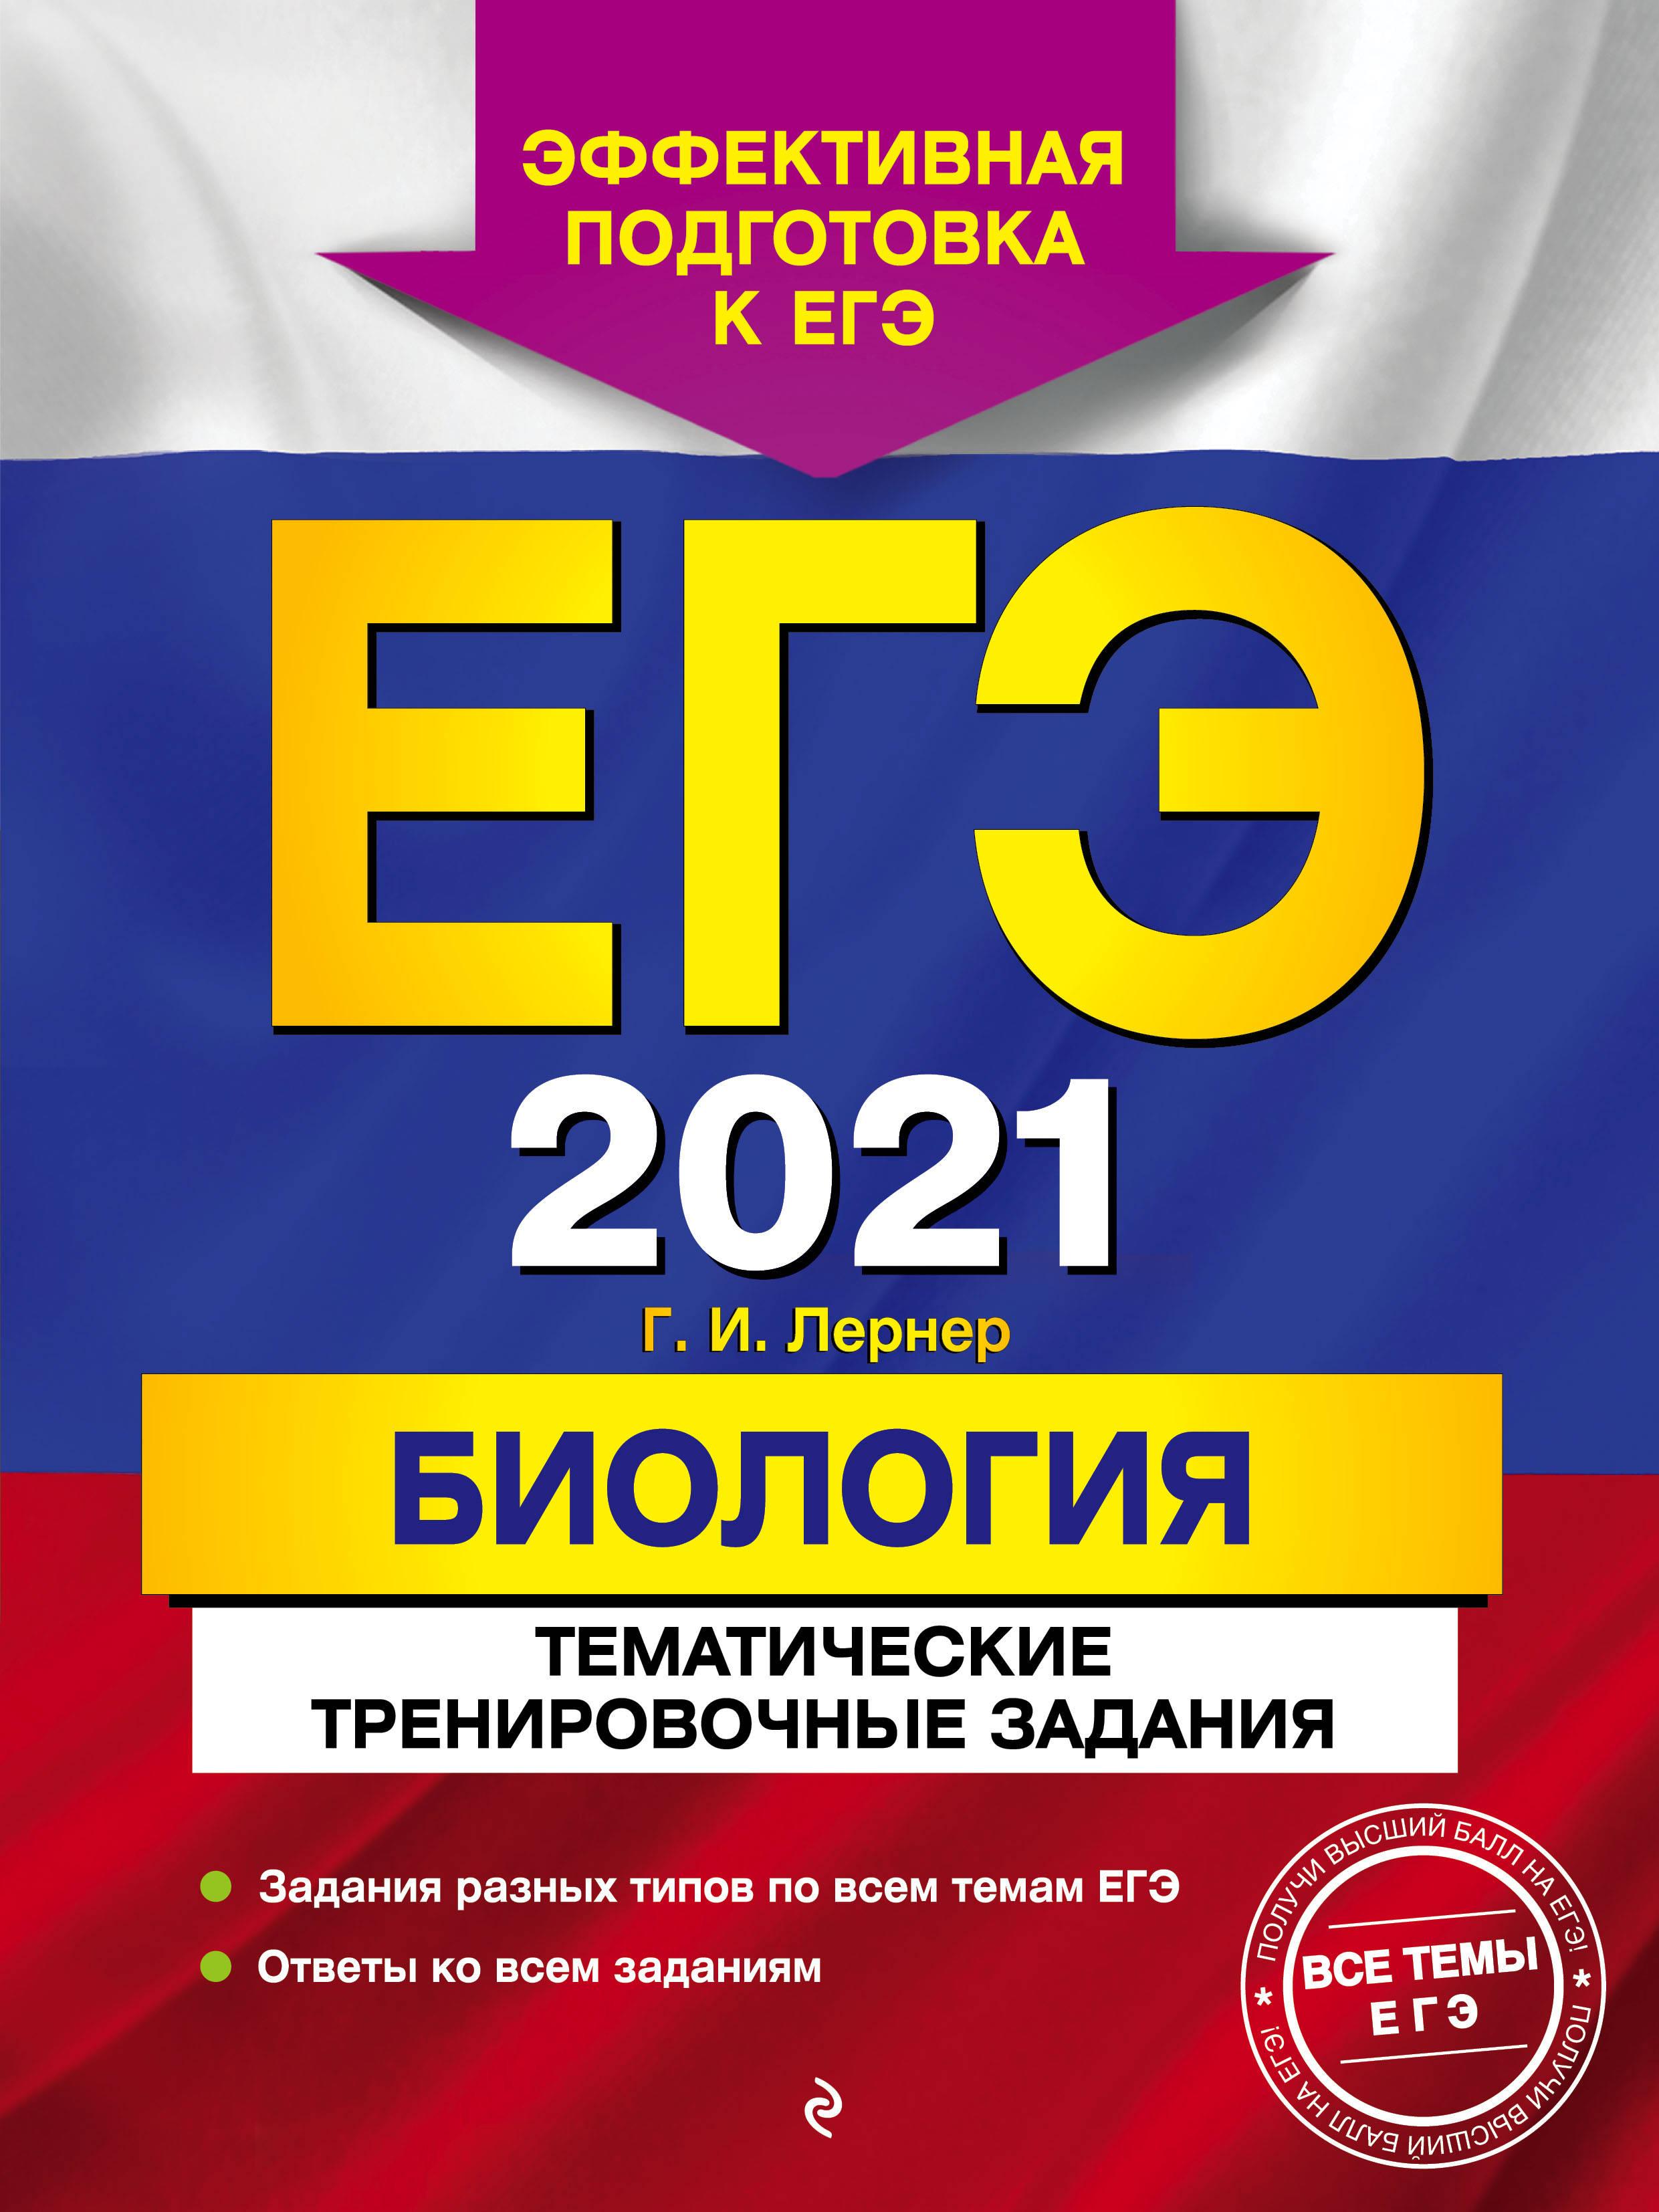 EGE-2021. Biologija. Tematicheskie trenirovochnye zadanija